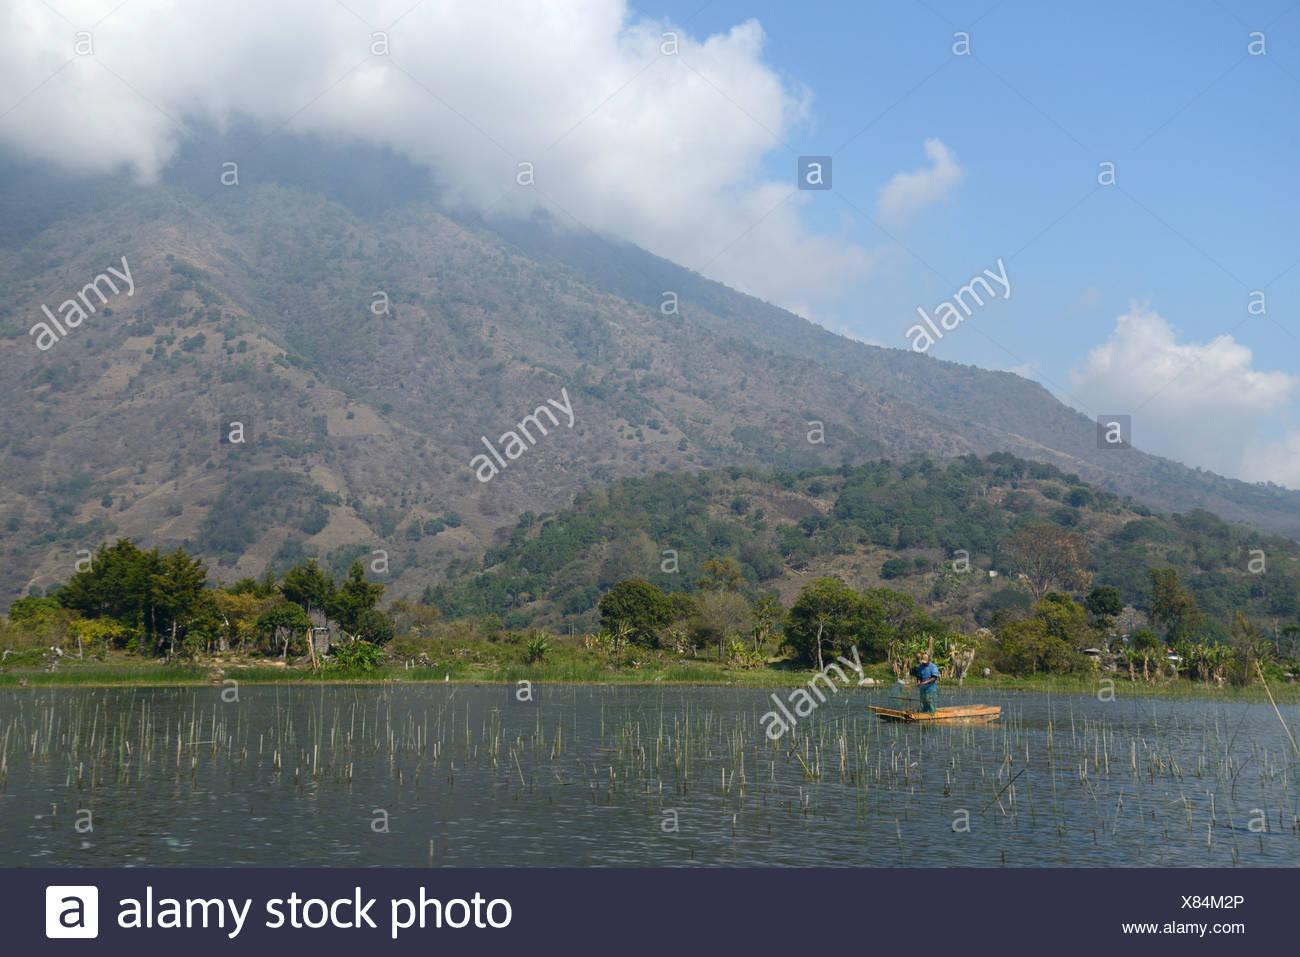 Central America, Guatemala, Lago de, Atitlan, lake, Santiago, boat, mountains, volcano, rim of fire, landscape, fisherman, Solol - Stock Image